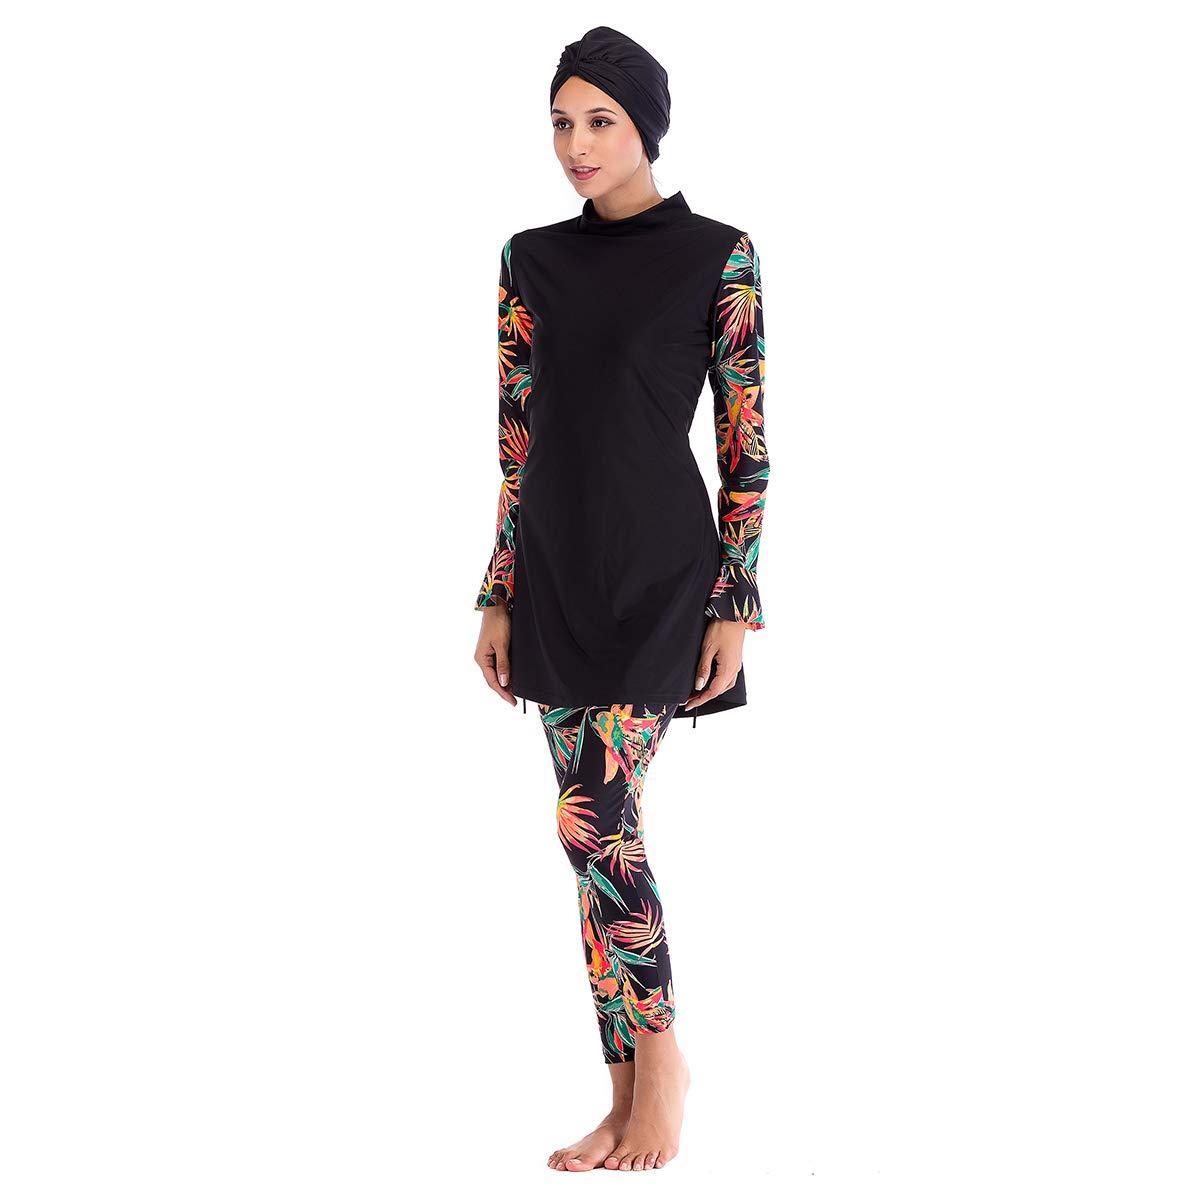 Seafanny Womens Modest Muslim Burkini Print 3 Pieces Swimwear Beach Swimsuits